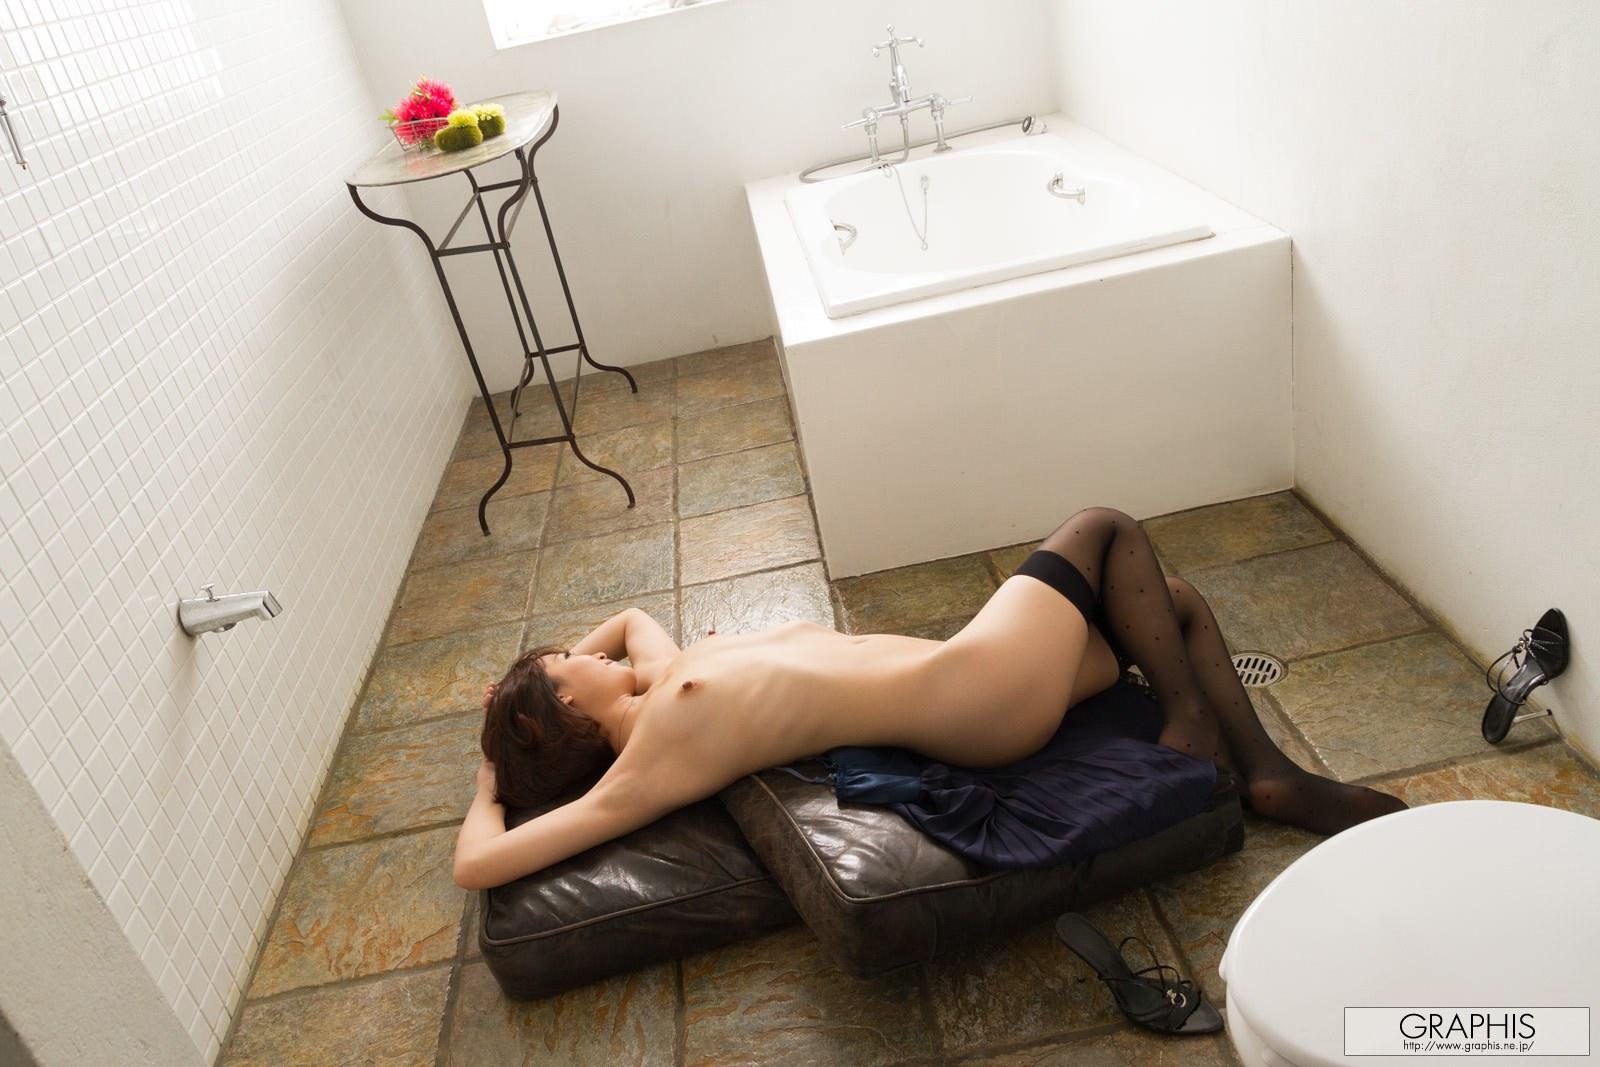 mayu-kamiya-bathroom-black-stockings-asian-naked-graphis-20